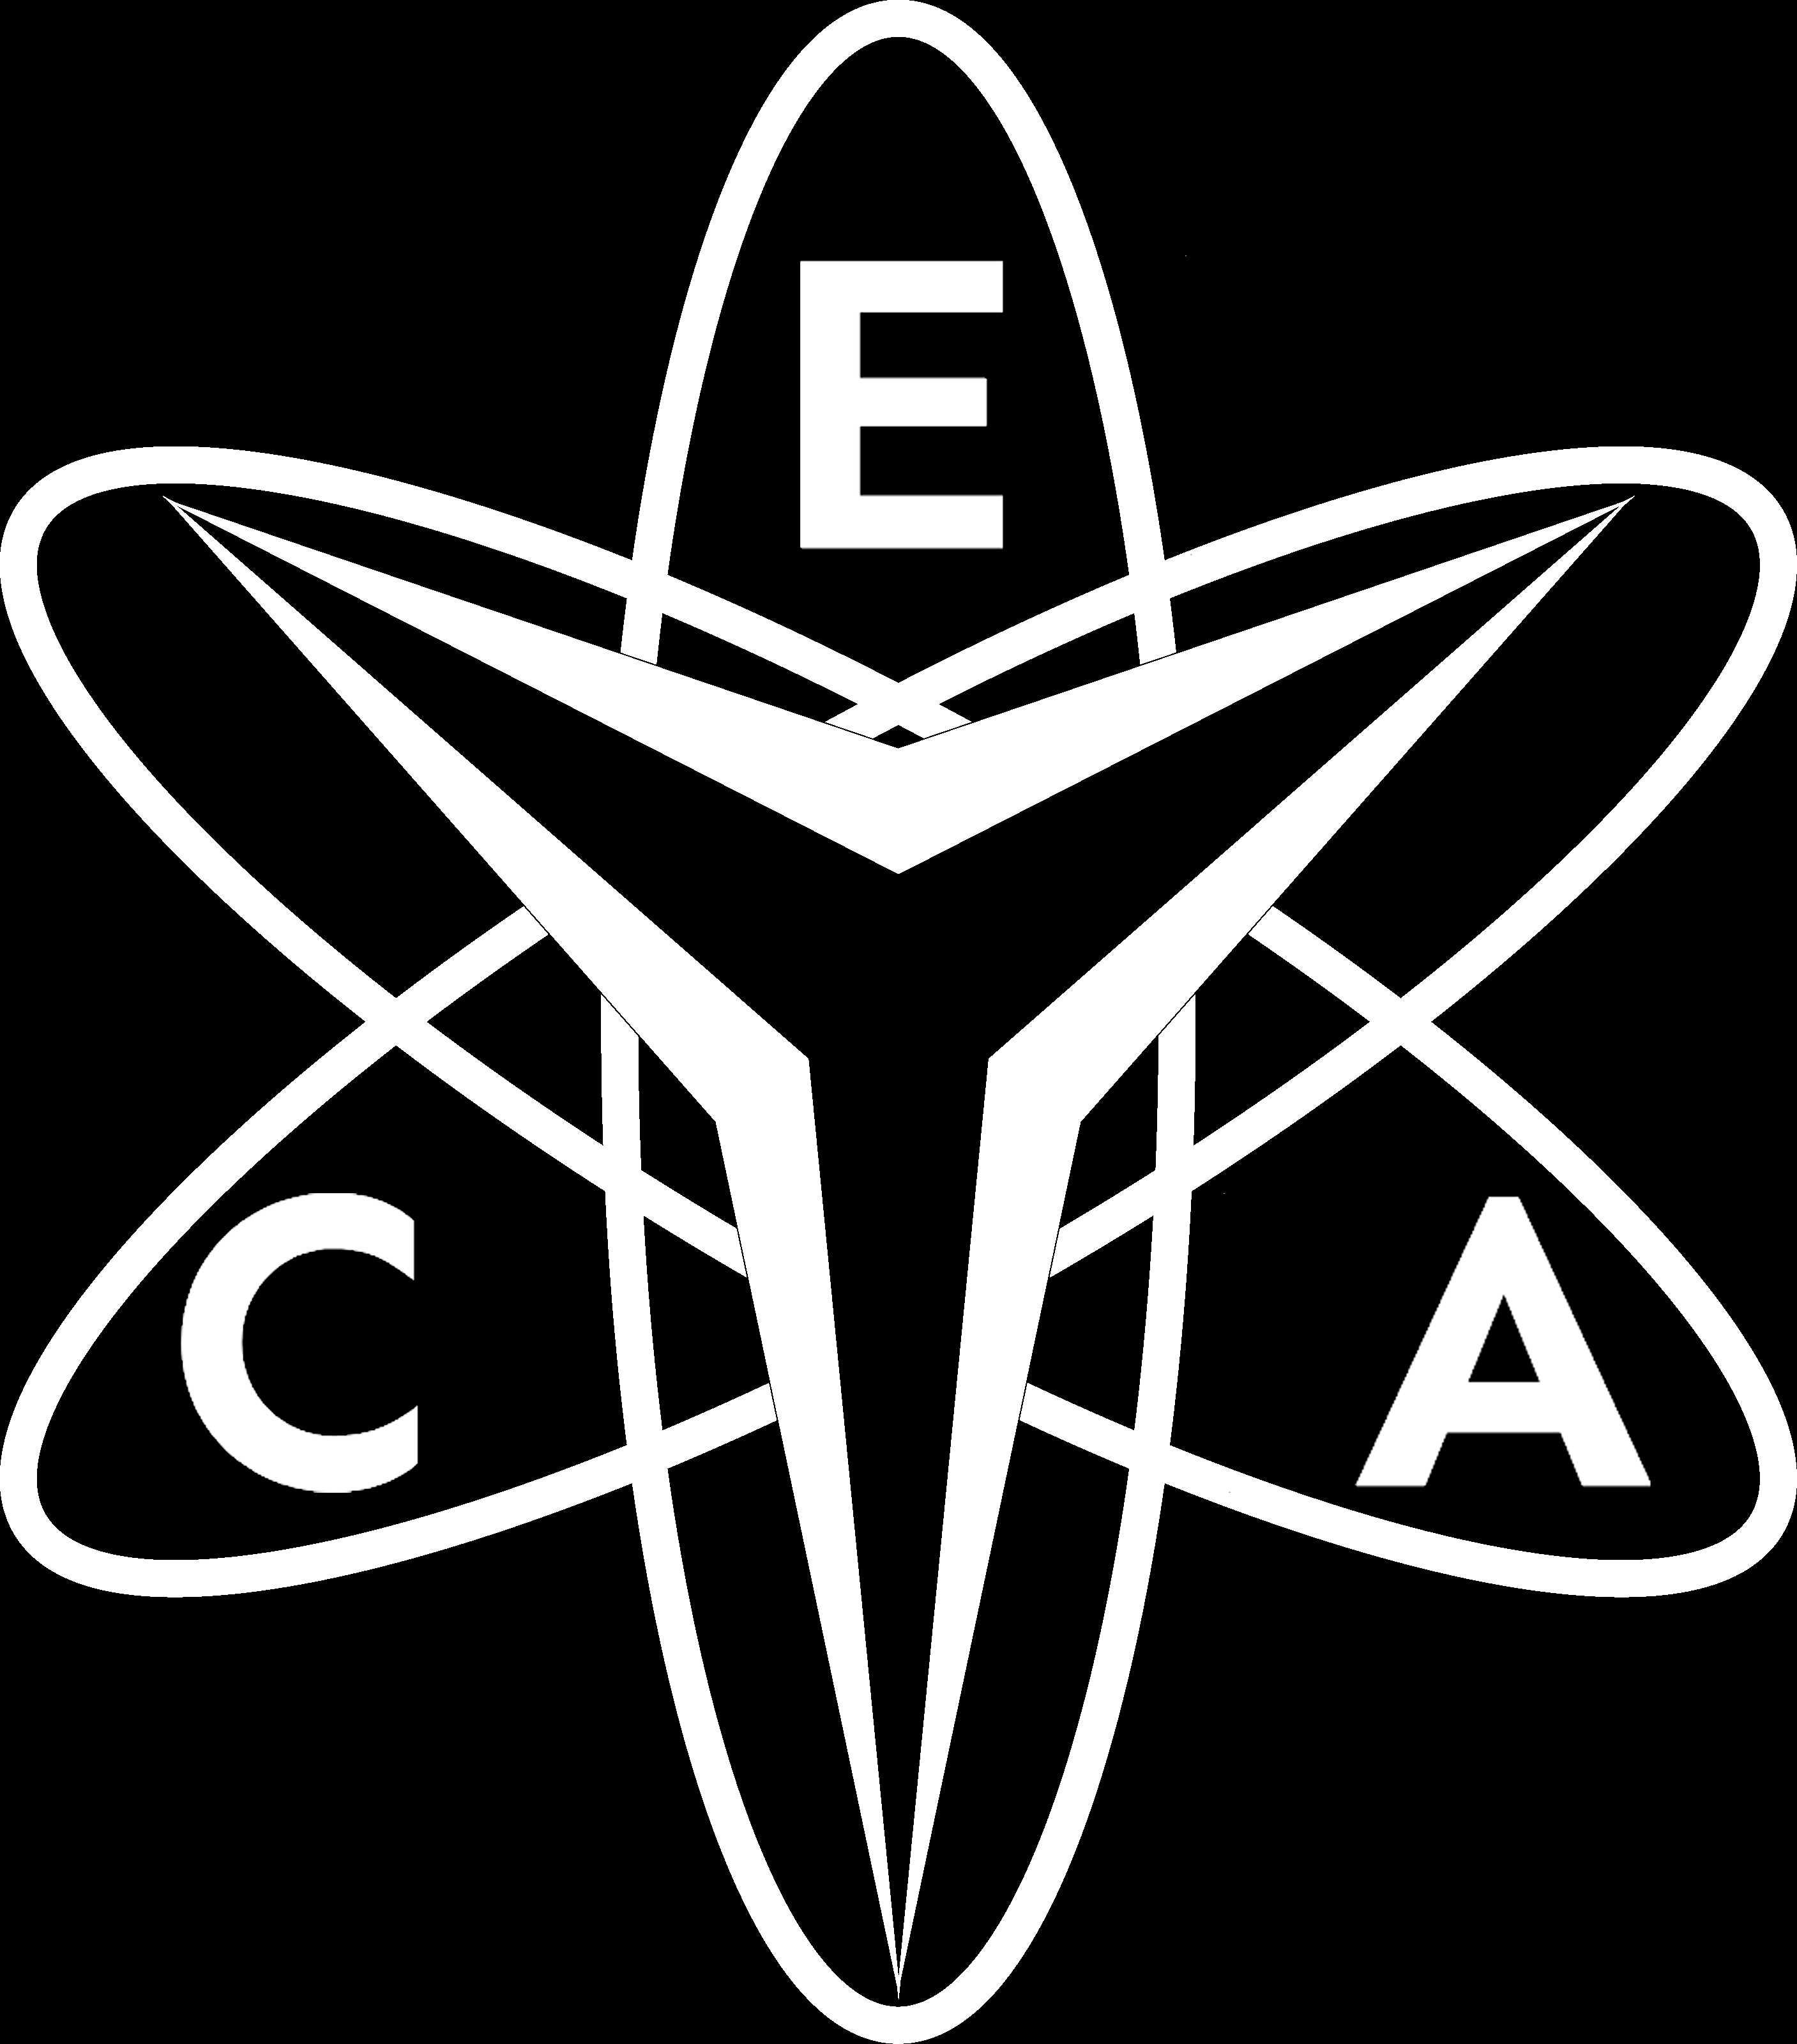 The ECA Phantoms's logo